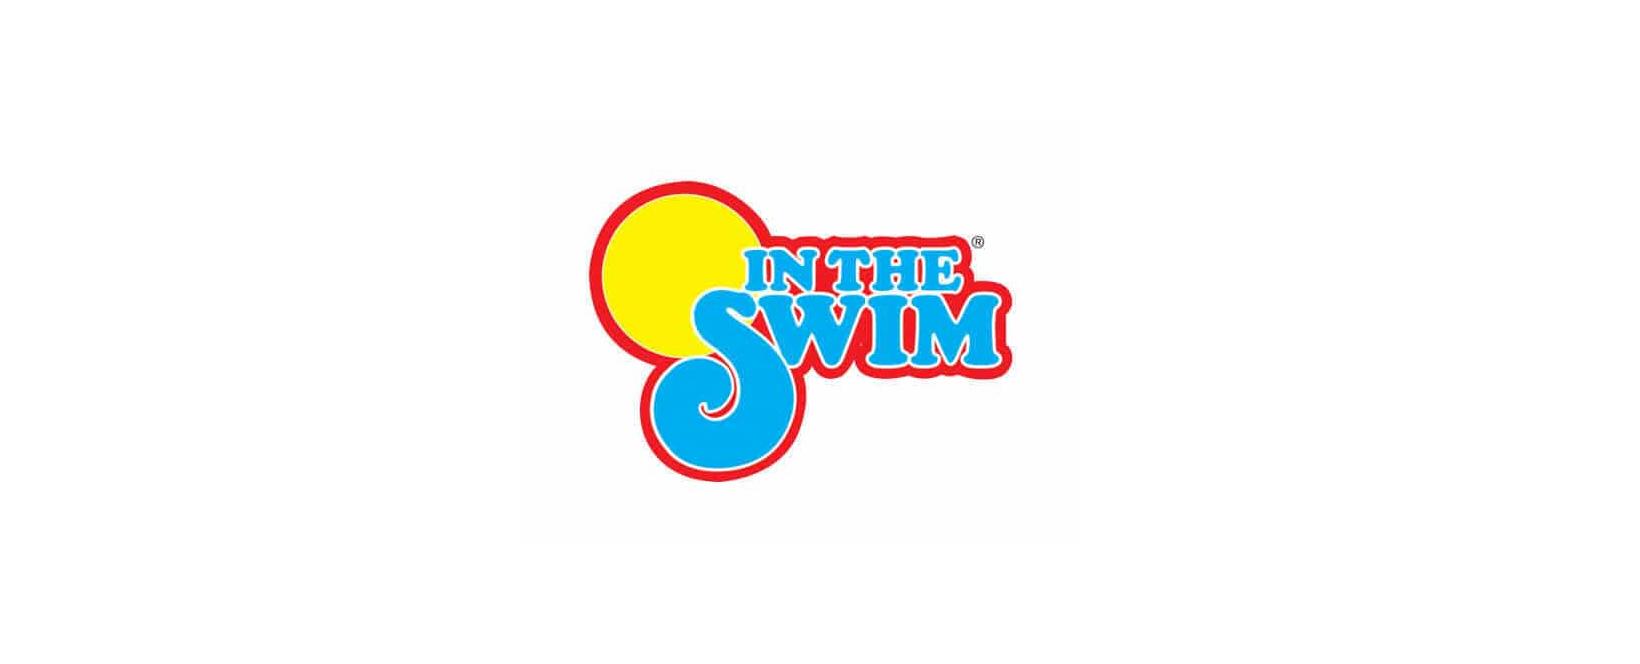 In The Swim Discount Code 2021